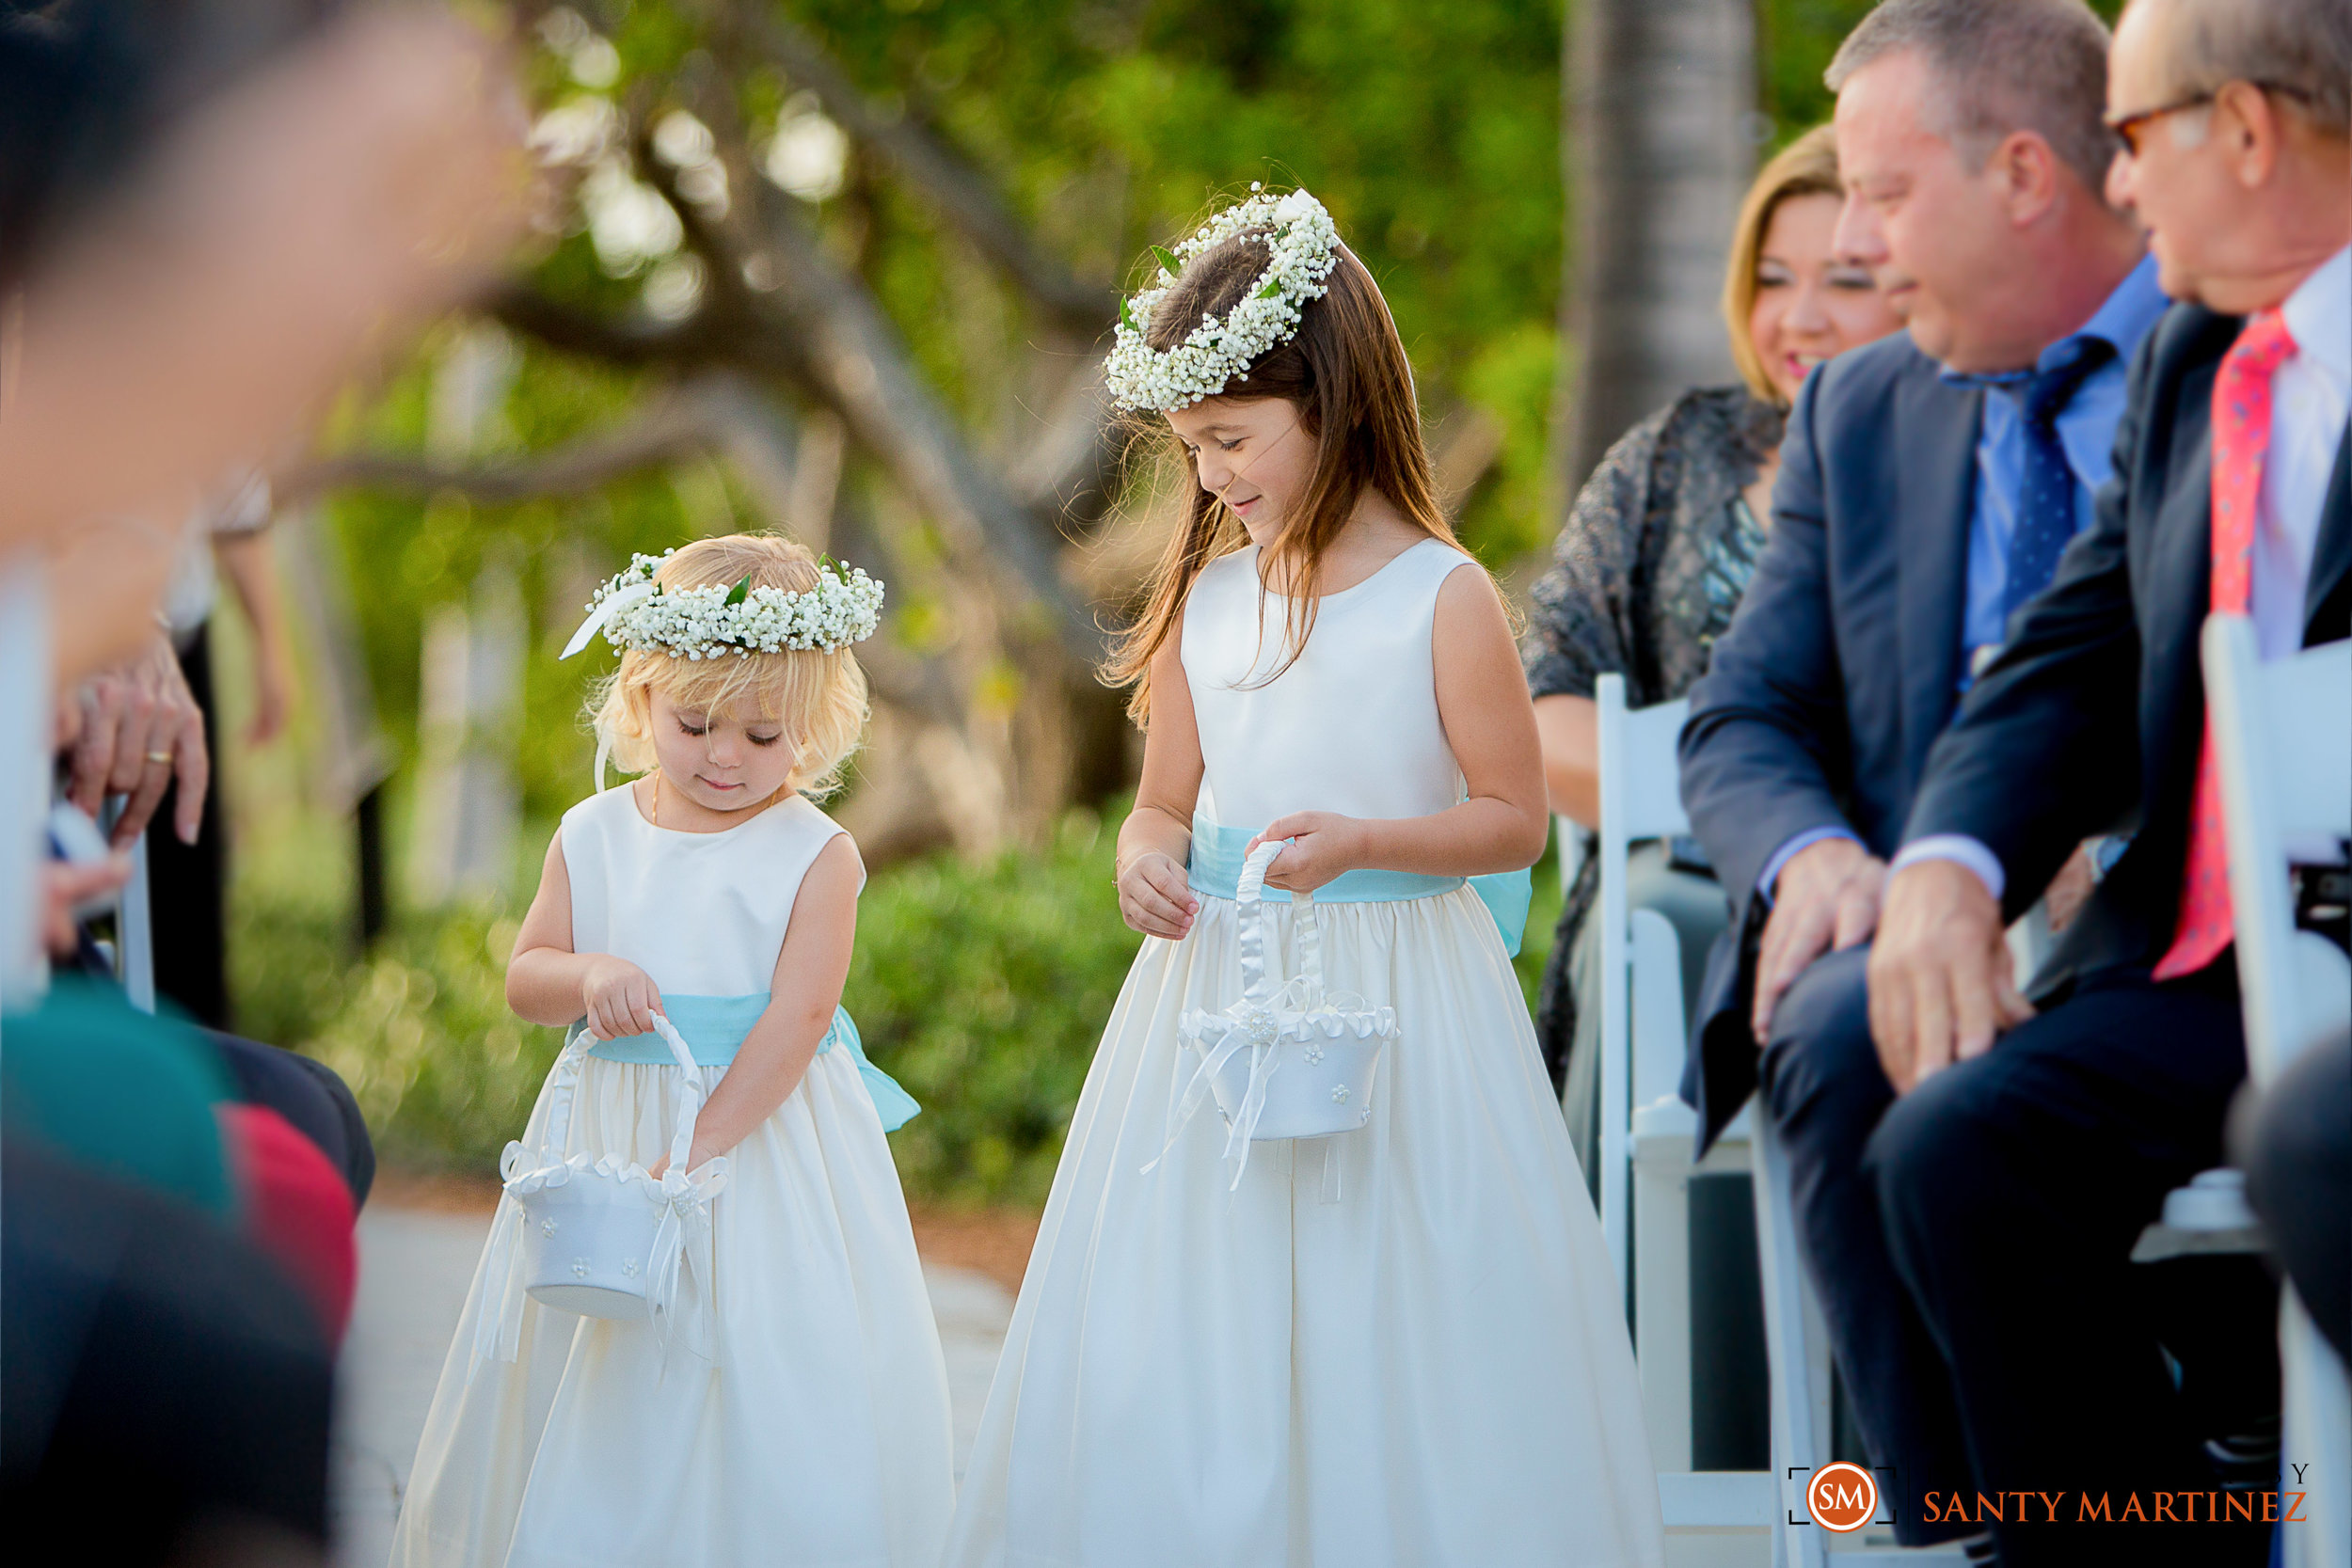 Miami Wedding Photographer - Santy Martinez -13.jpg